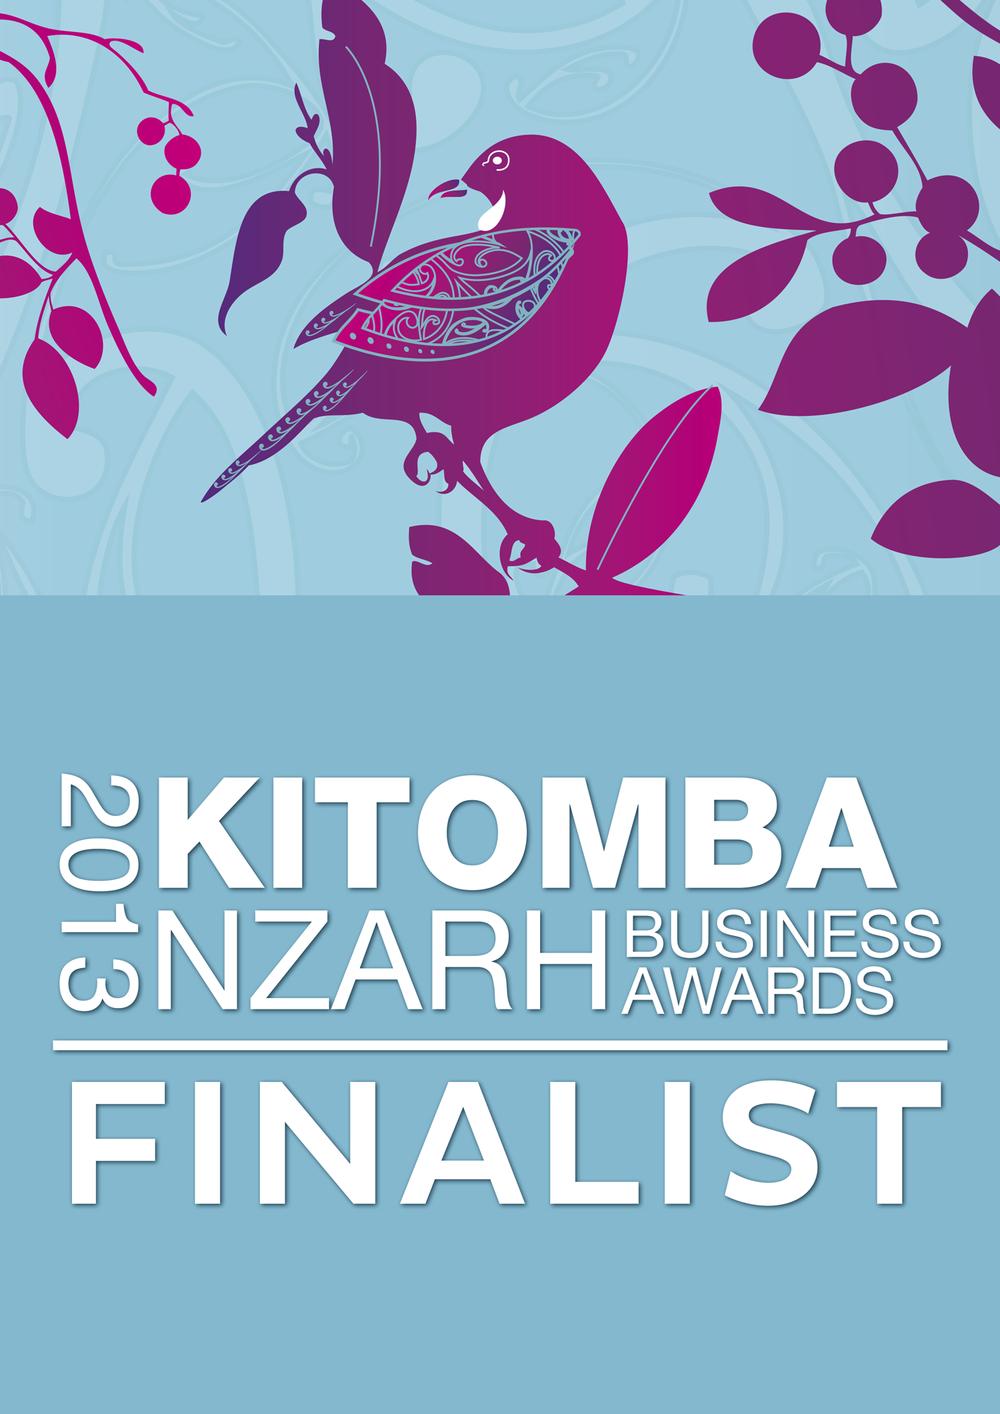 2013-Kitomba-NZARH-Awards_A4-Finalist-Poster.png